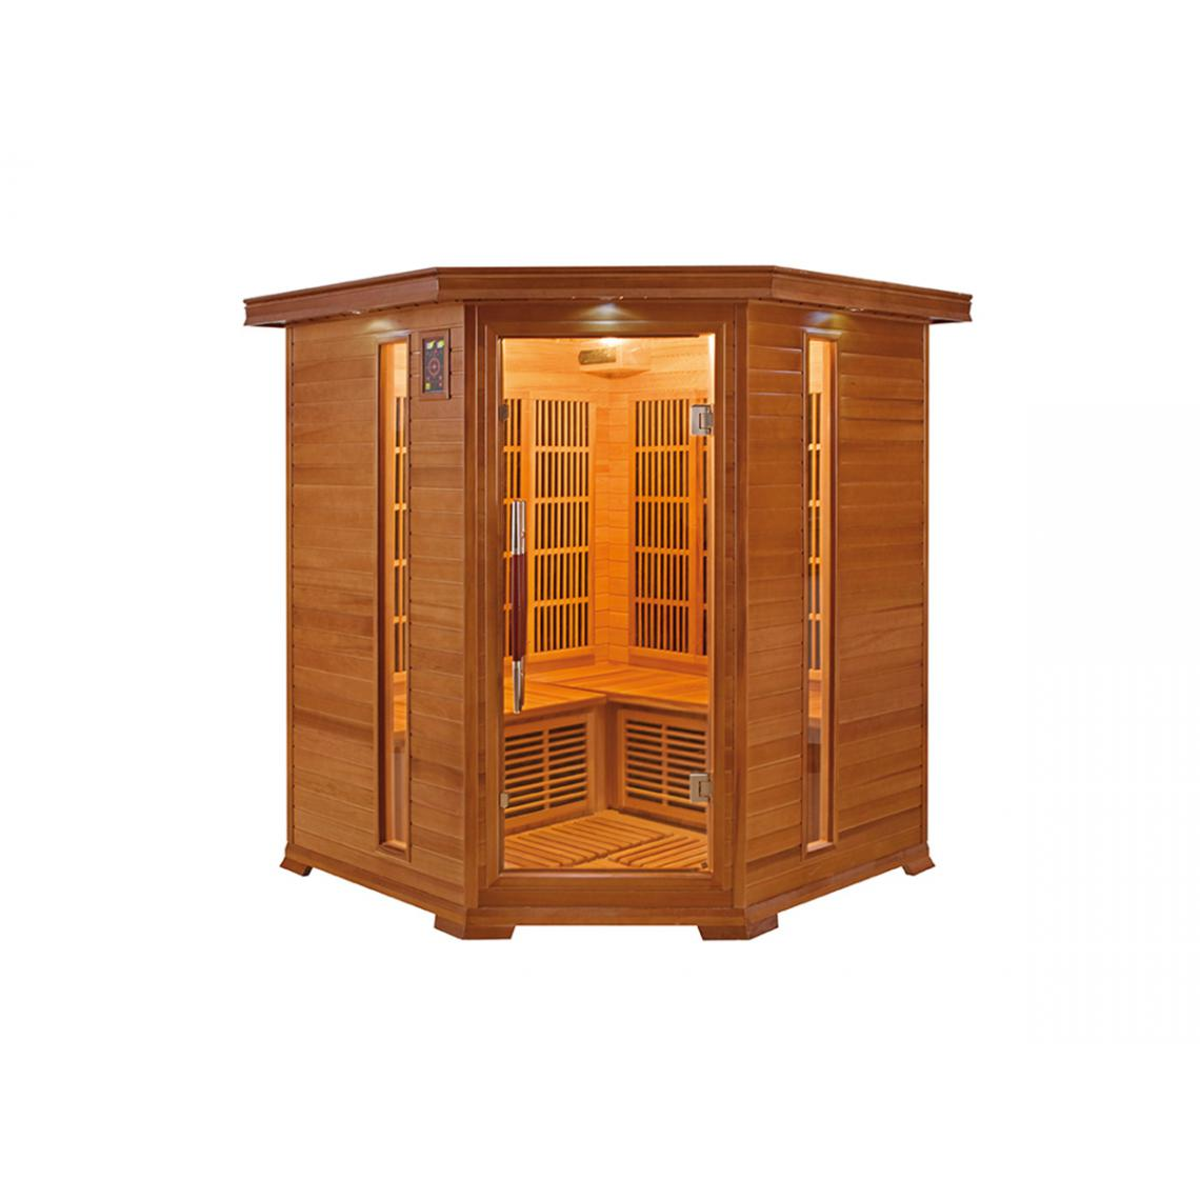 France Sauna Sauna infrarouge 3/4 places Luxe - France Sauna